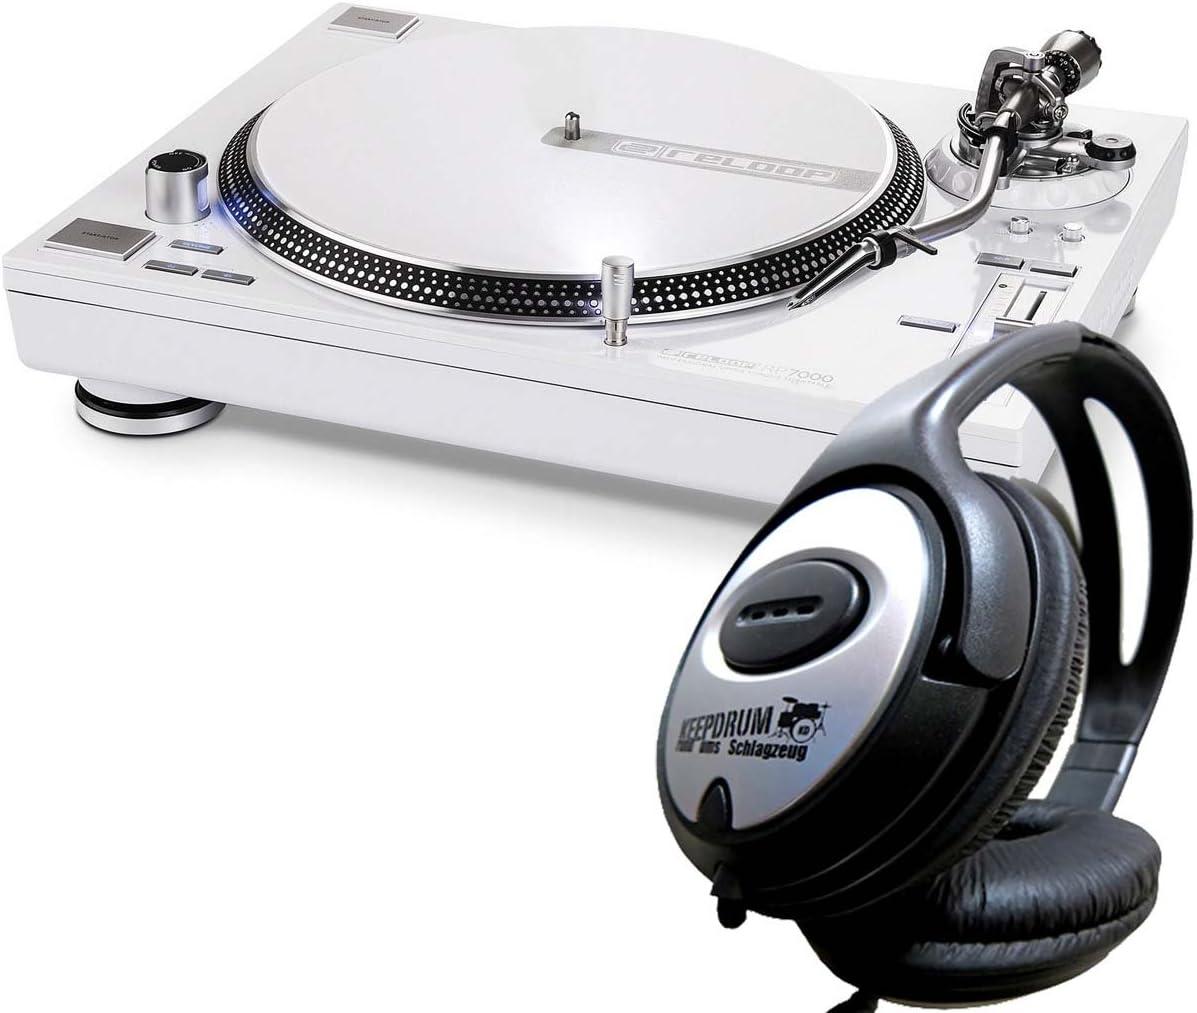 Reloop RP-7000 Tocadiscos WH White DJ-Tocadiscos con Upper Torque ...